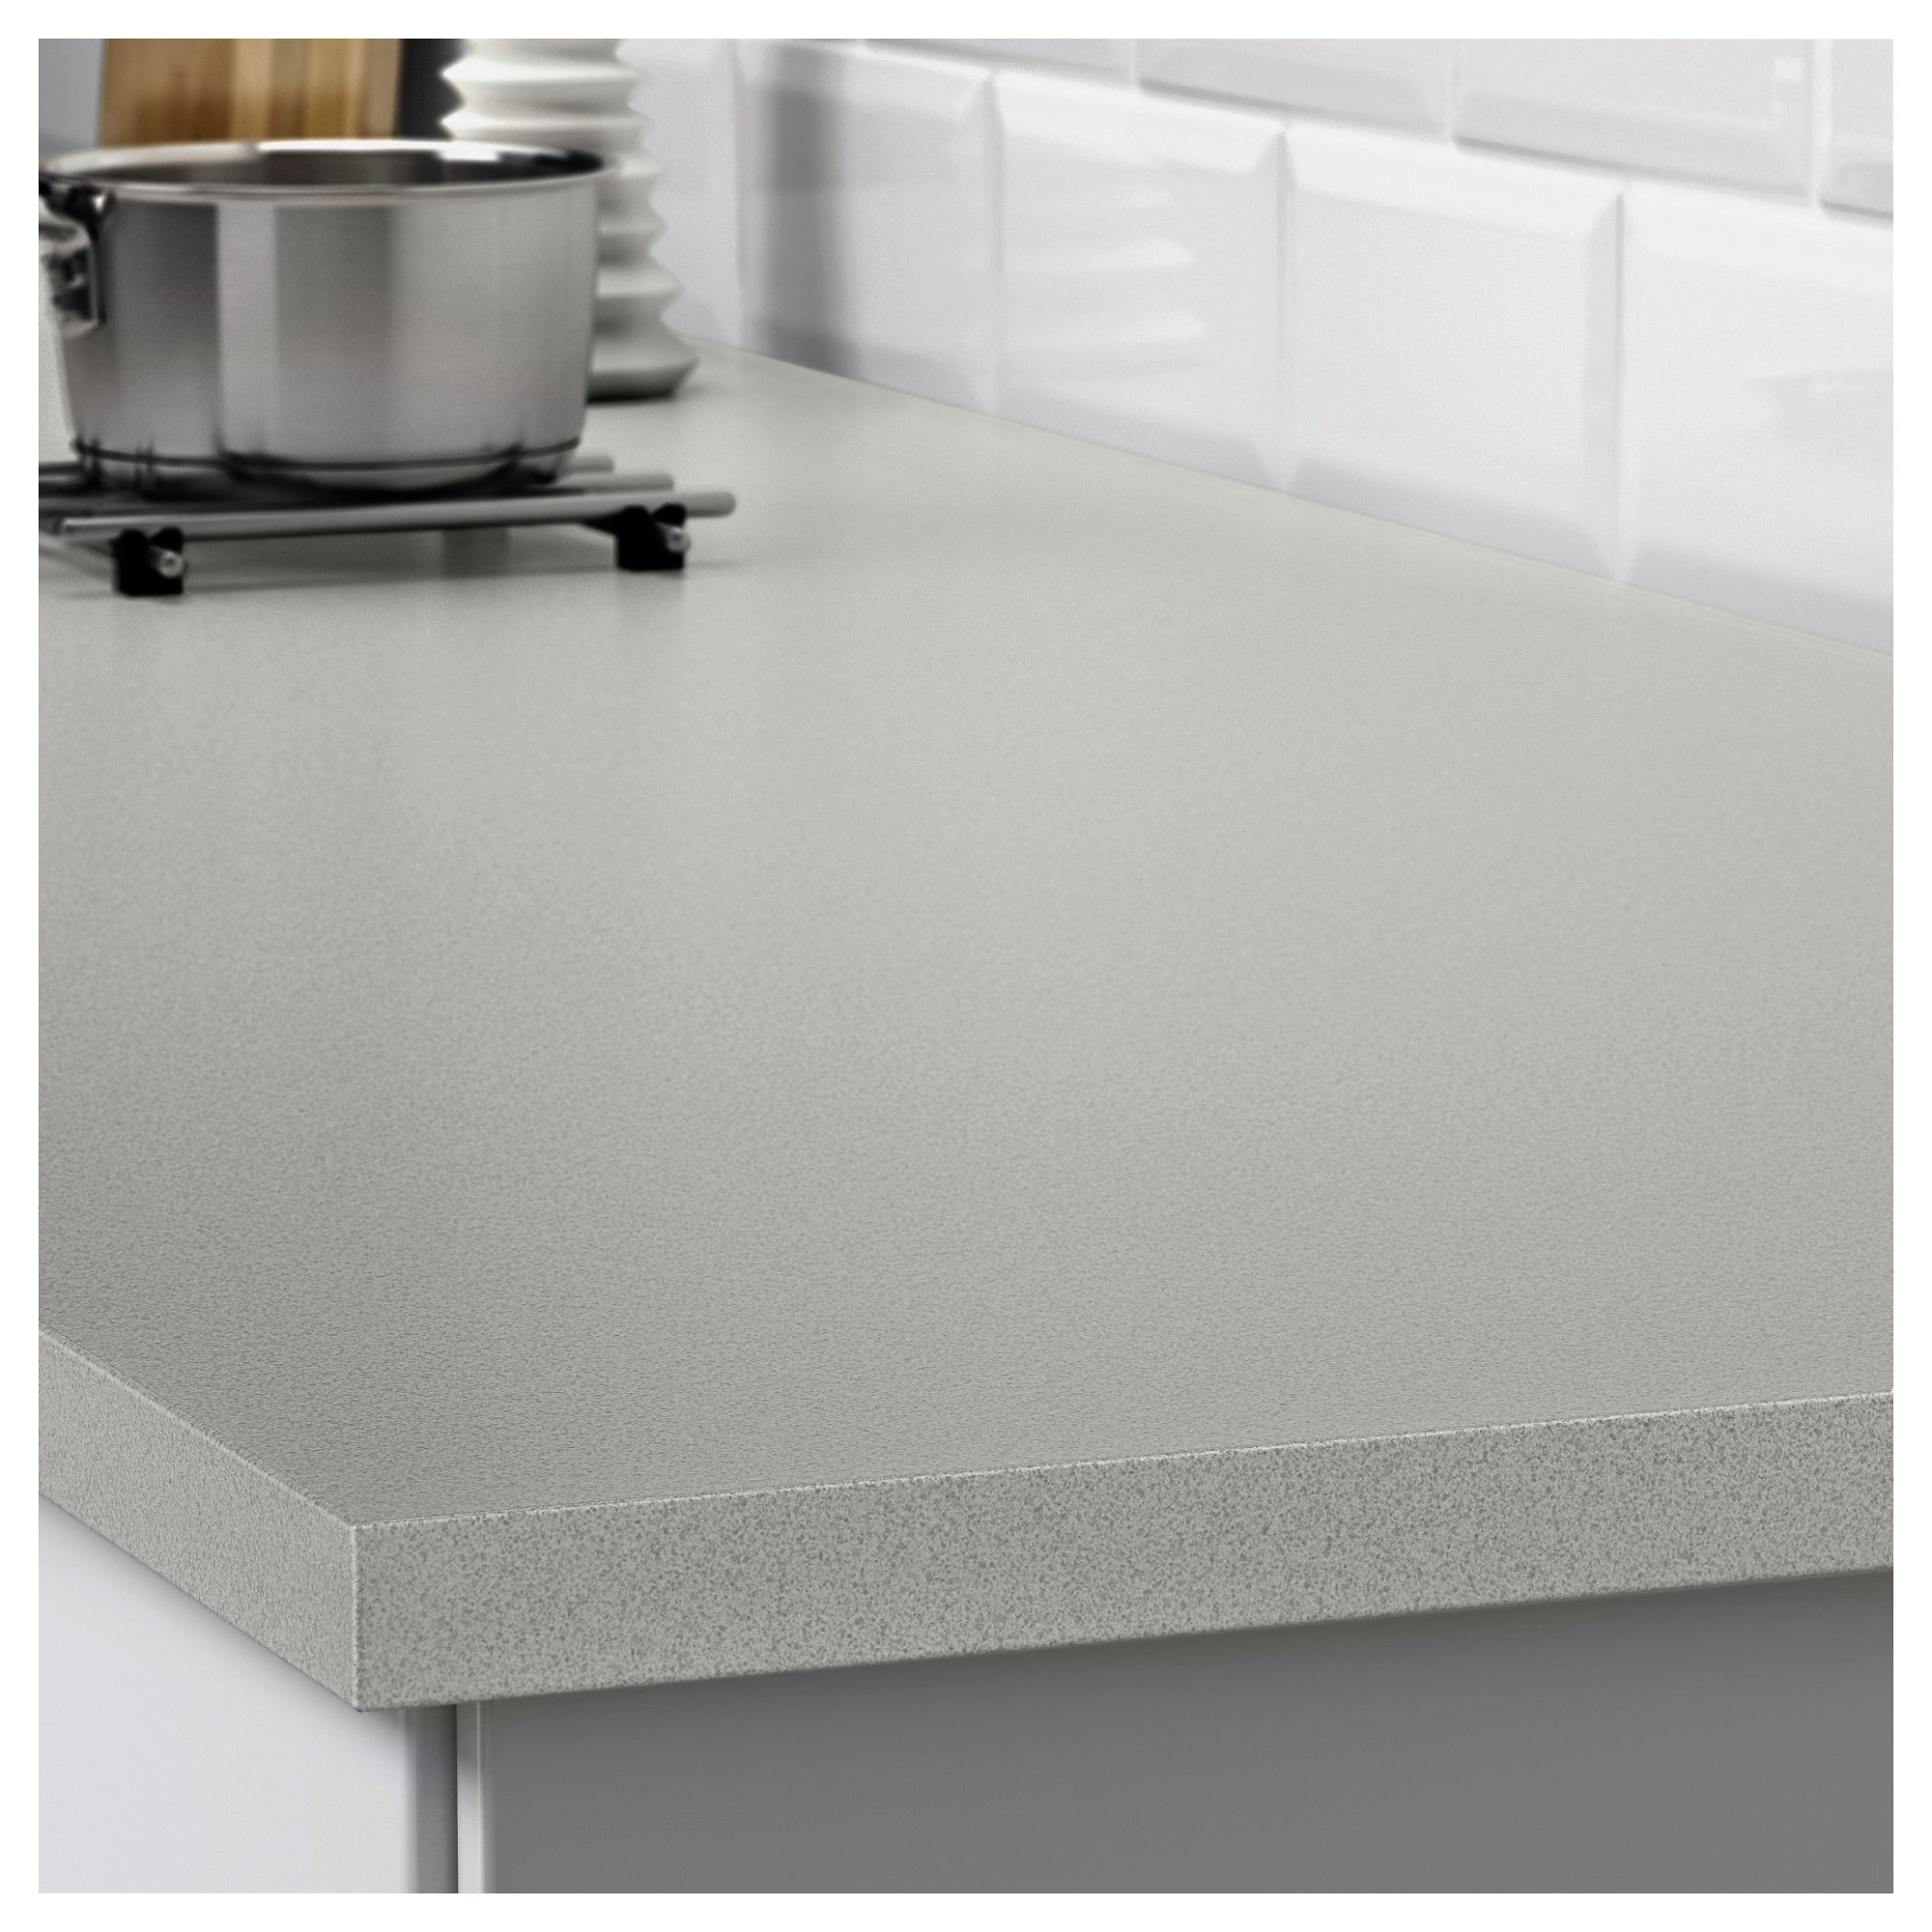 Ikea Ekbacken Countertop Light Gray Stone Effect